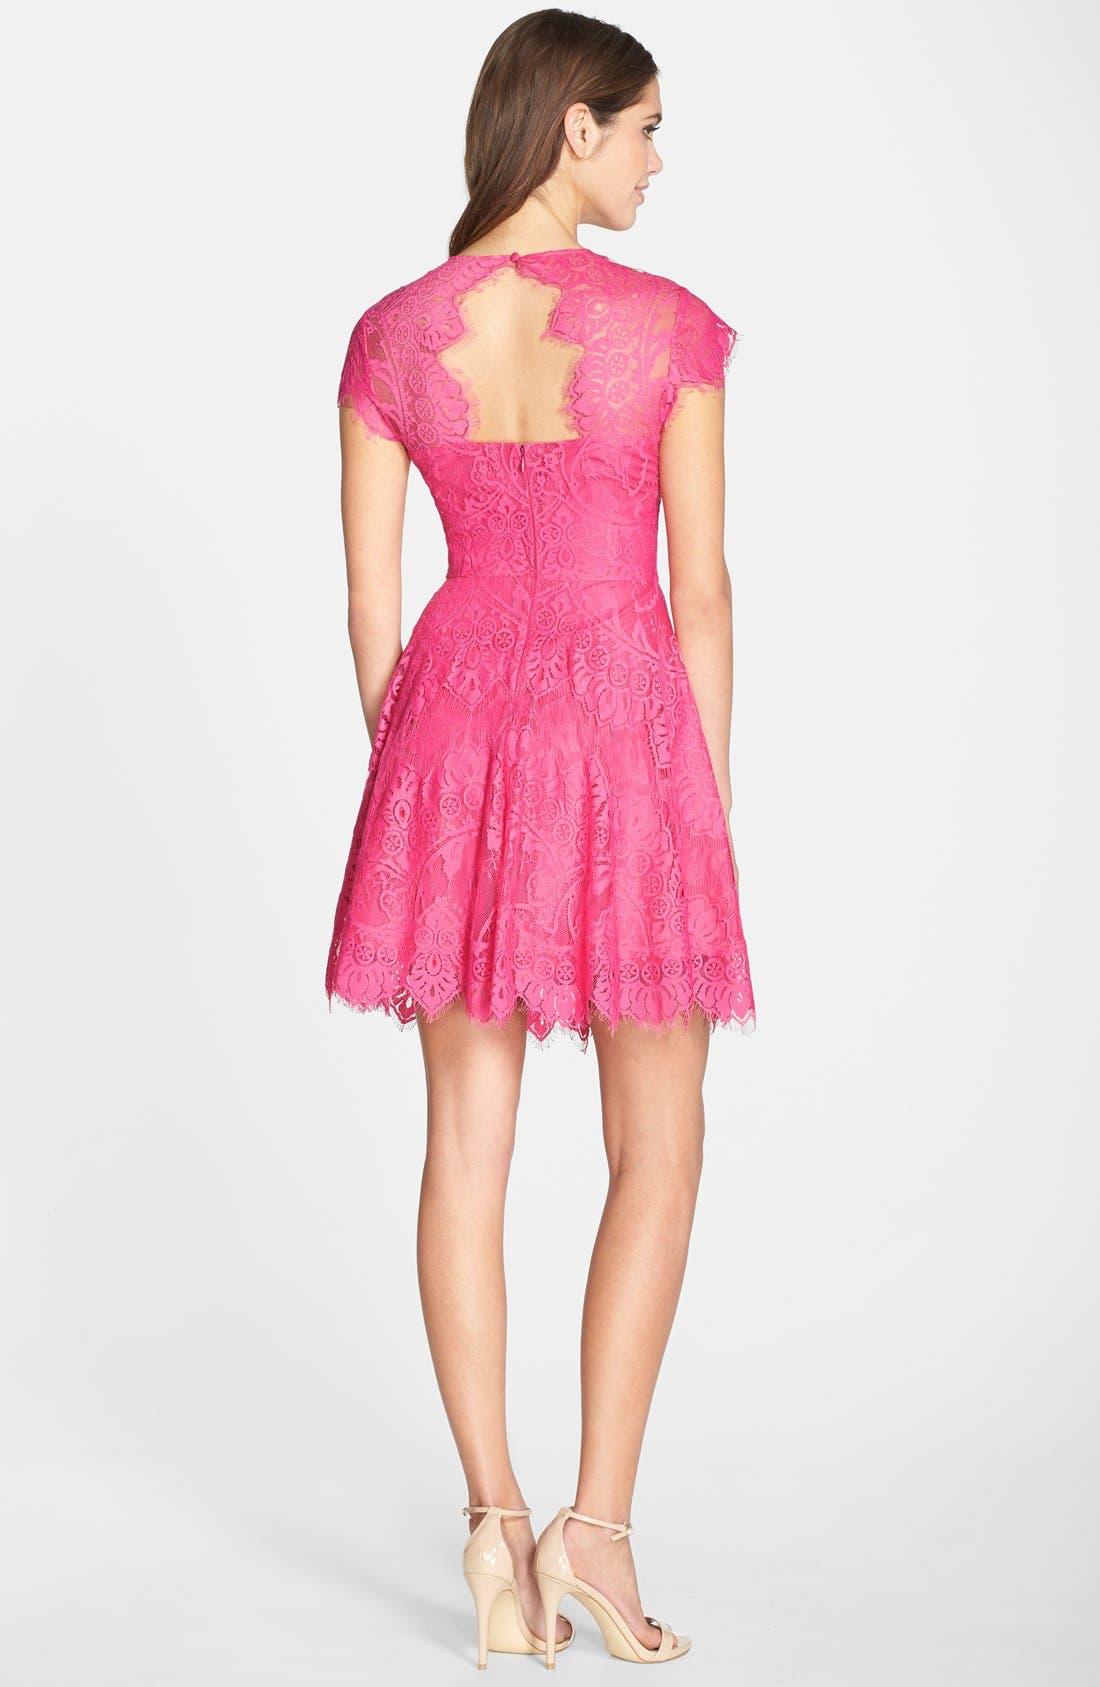 'Rhianna' Illusion Yoke Lace Fit & Flare Dress,                             Alternate thumbnail 2, color,                             Fuchsia/ Rose